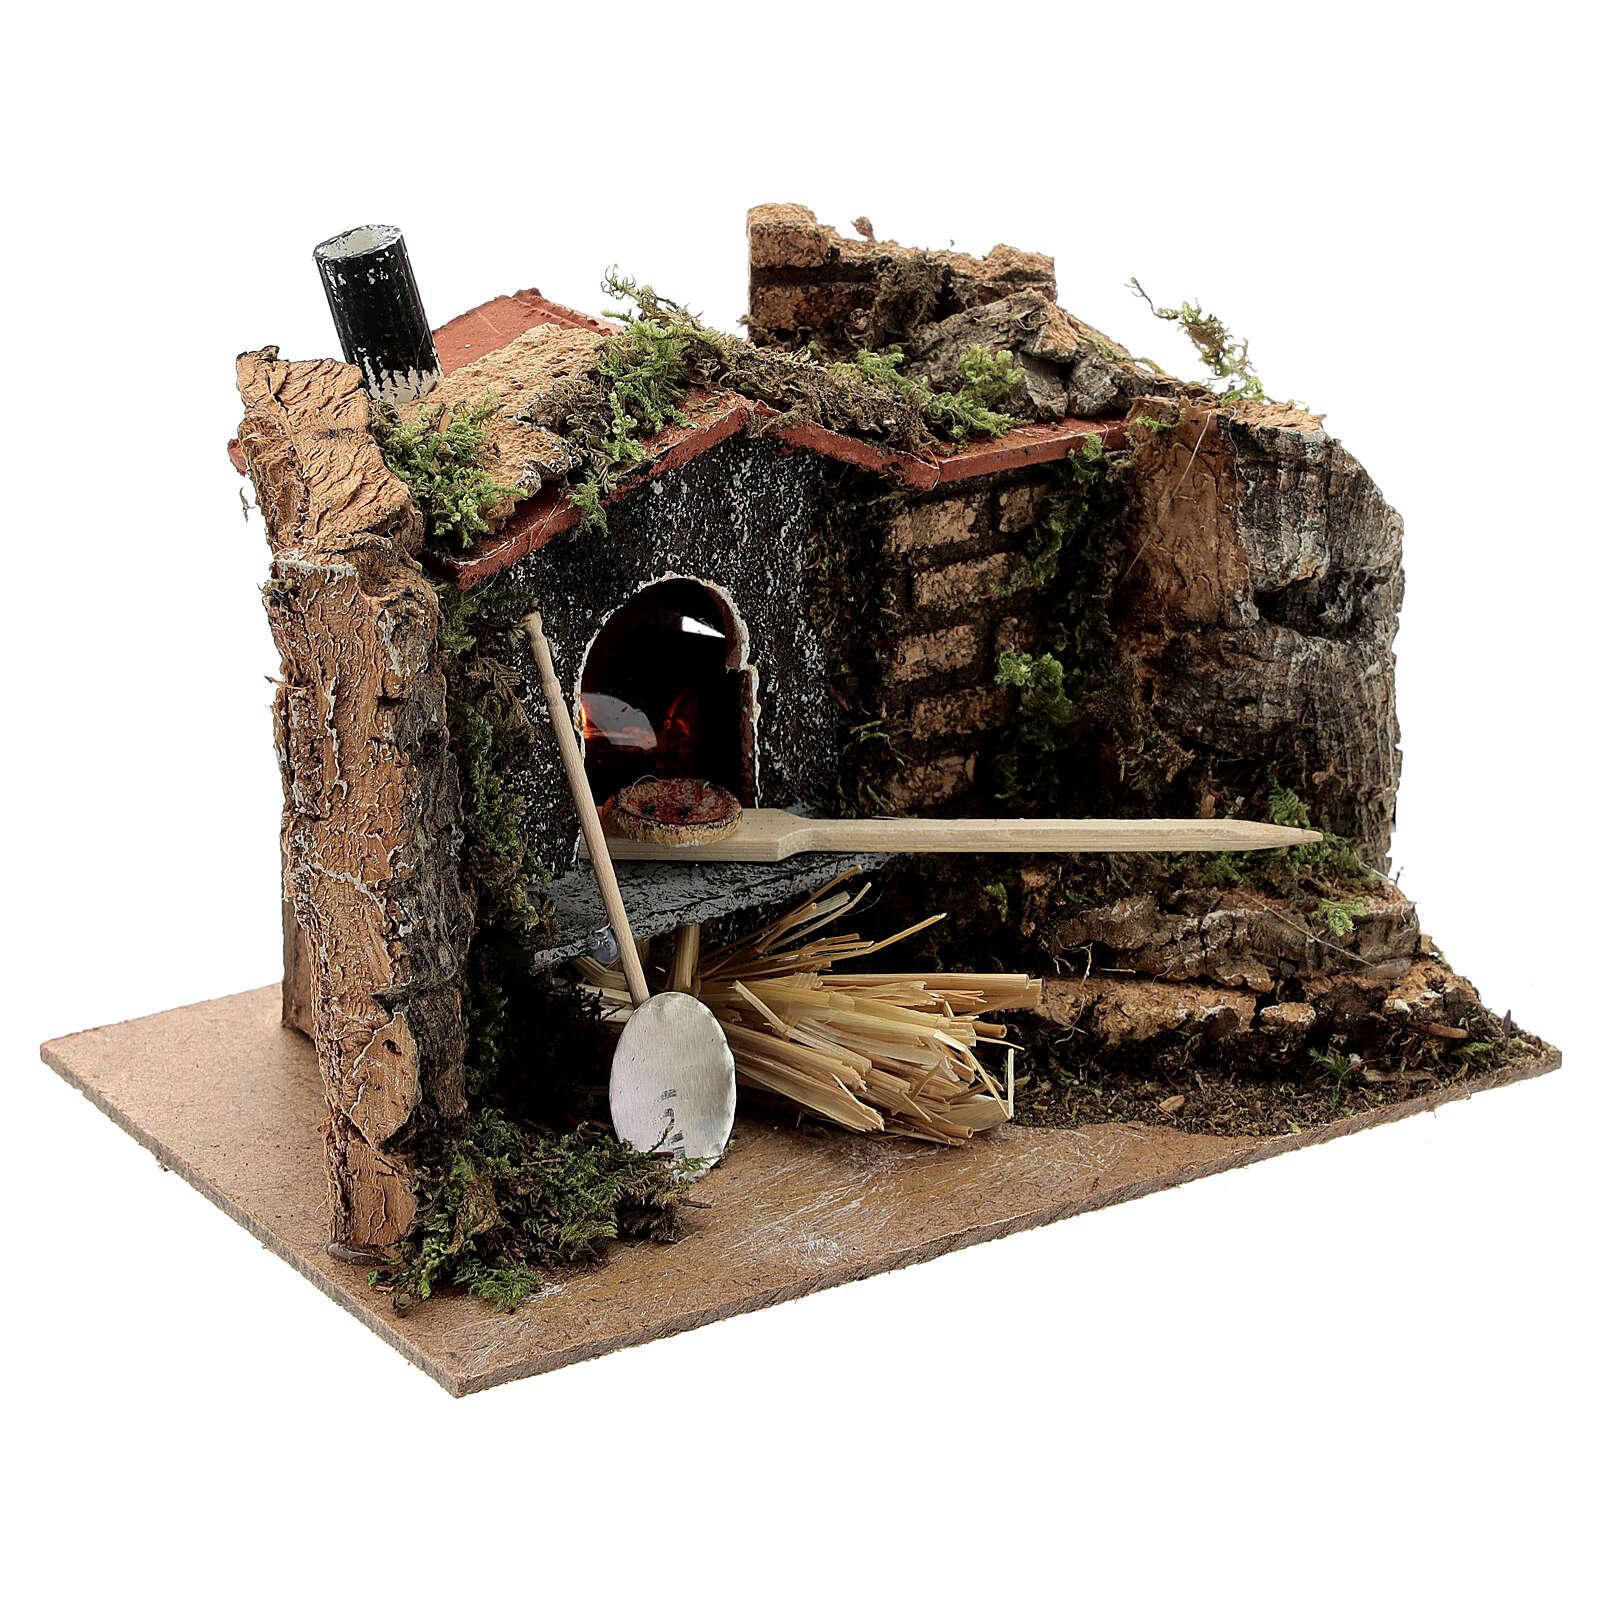 Mini brick pizza oven FIRE FLAME EFFECT bulb 10x15x10 cm nativity 6-8 cm 4